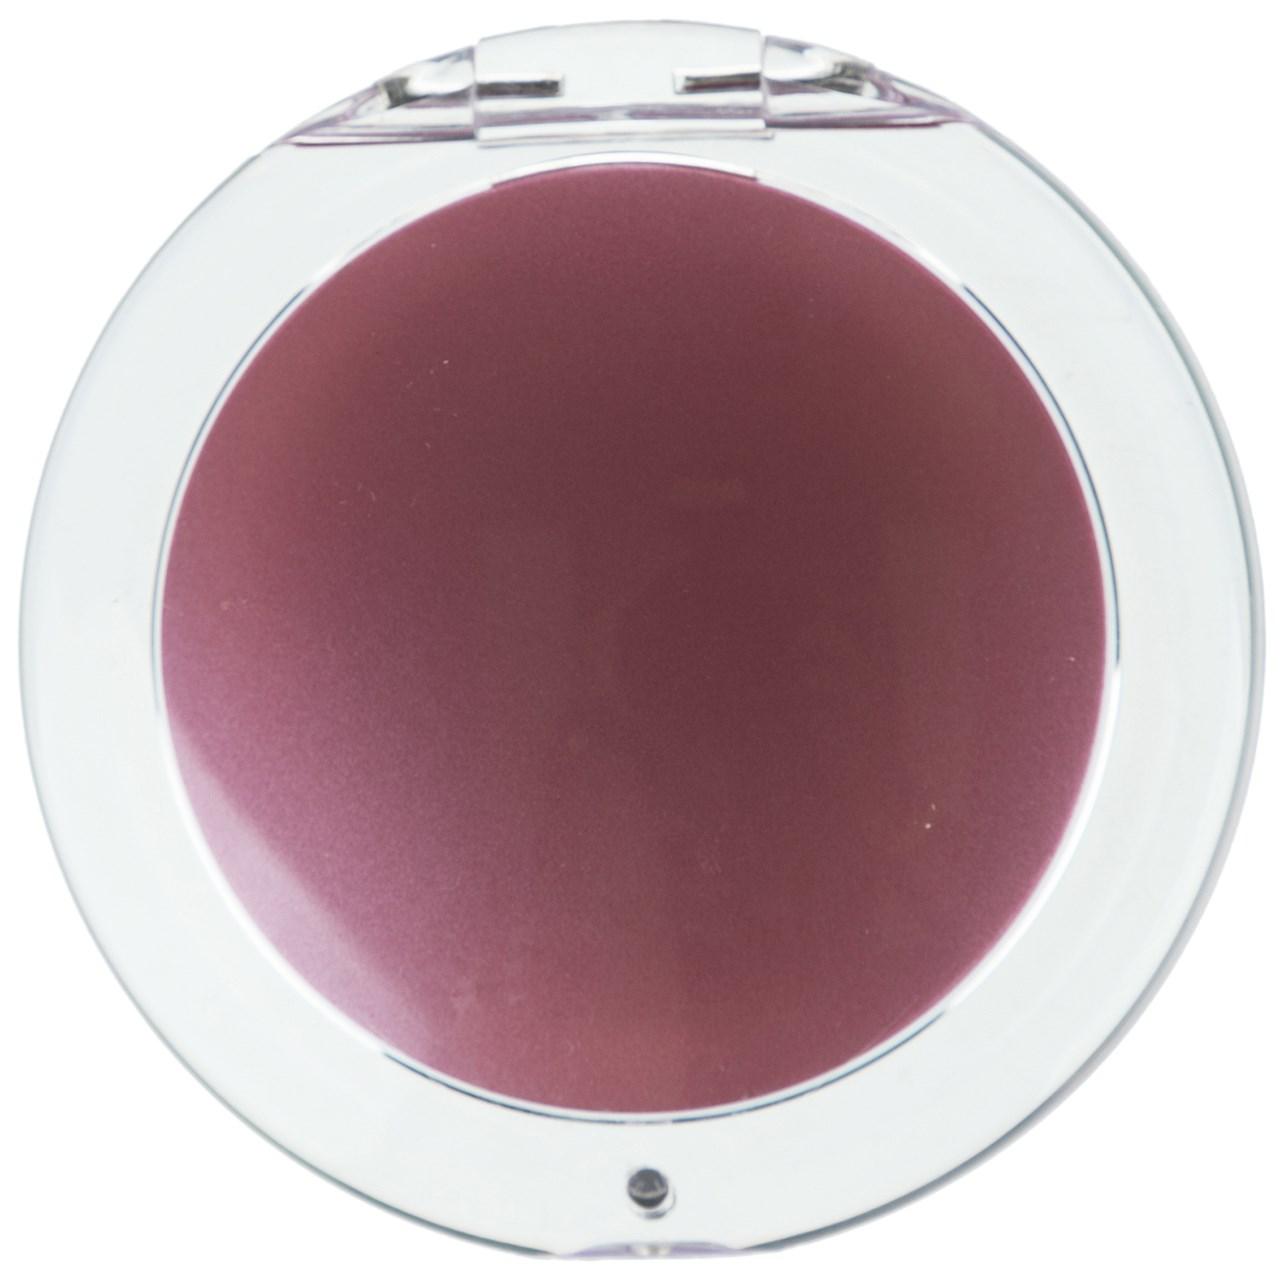 آینه آرایشی اسپارکل مدل 493